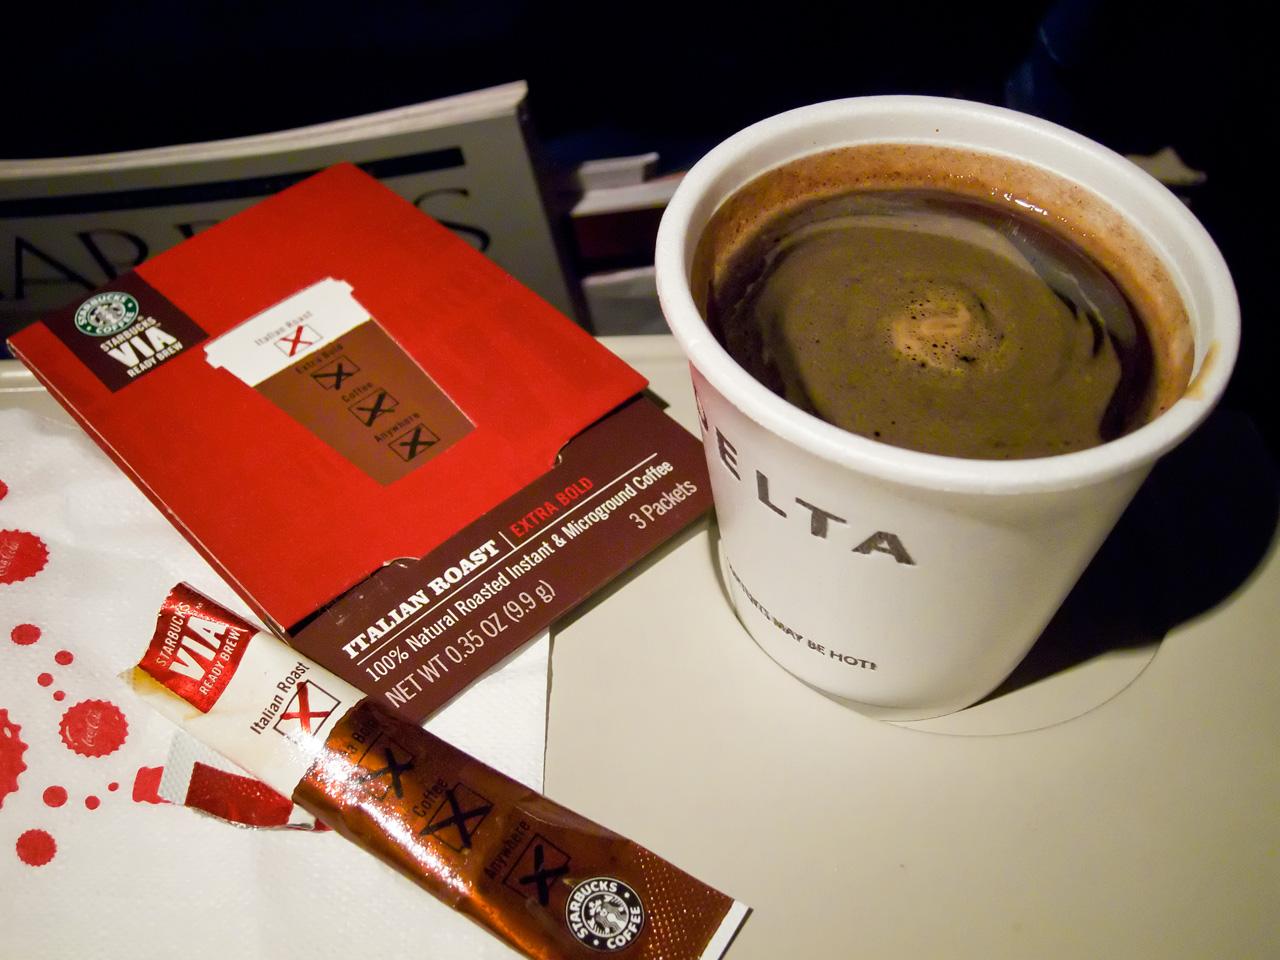 20091128-03-starbucks-via-ready-brew-instant-coffee-i-1